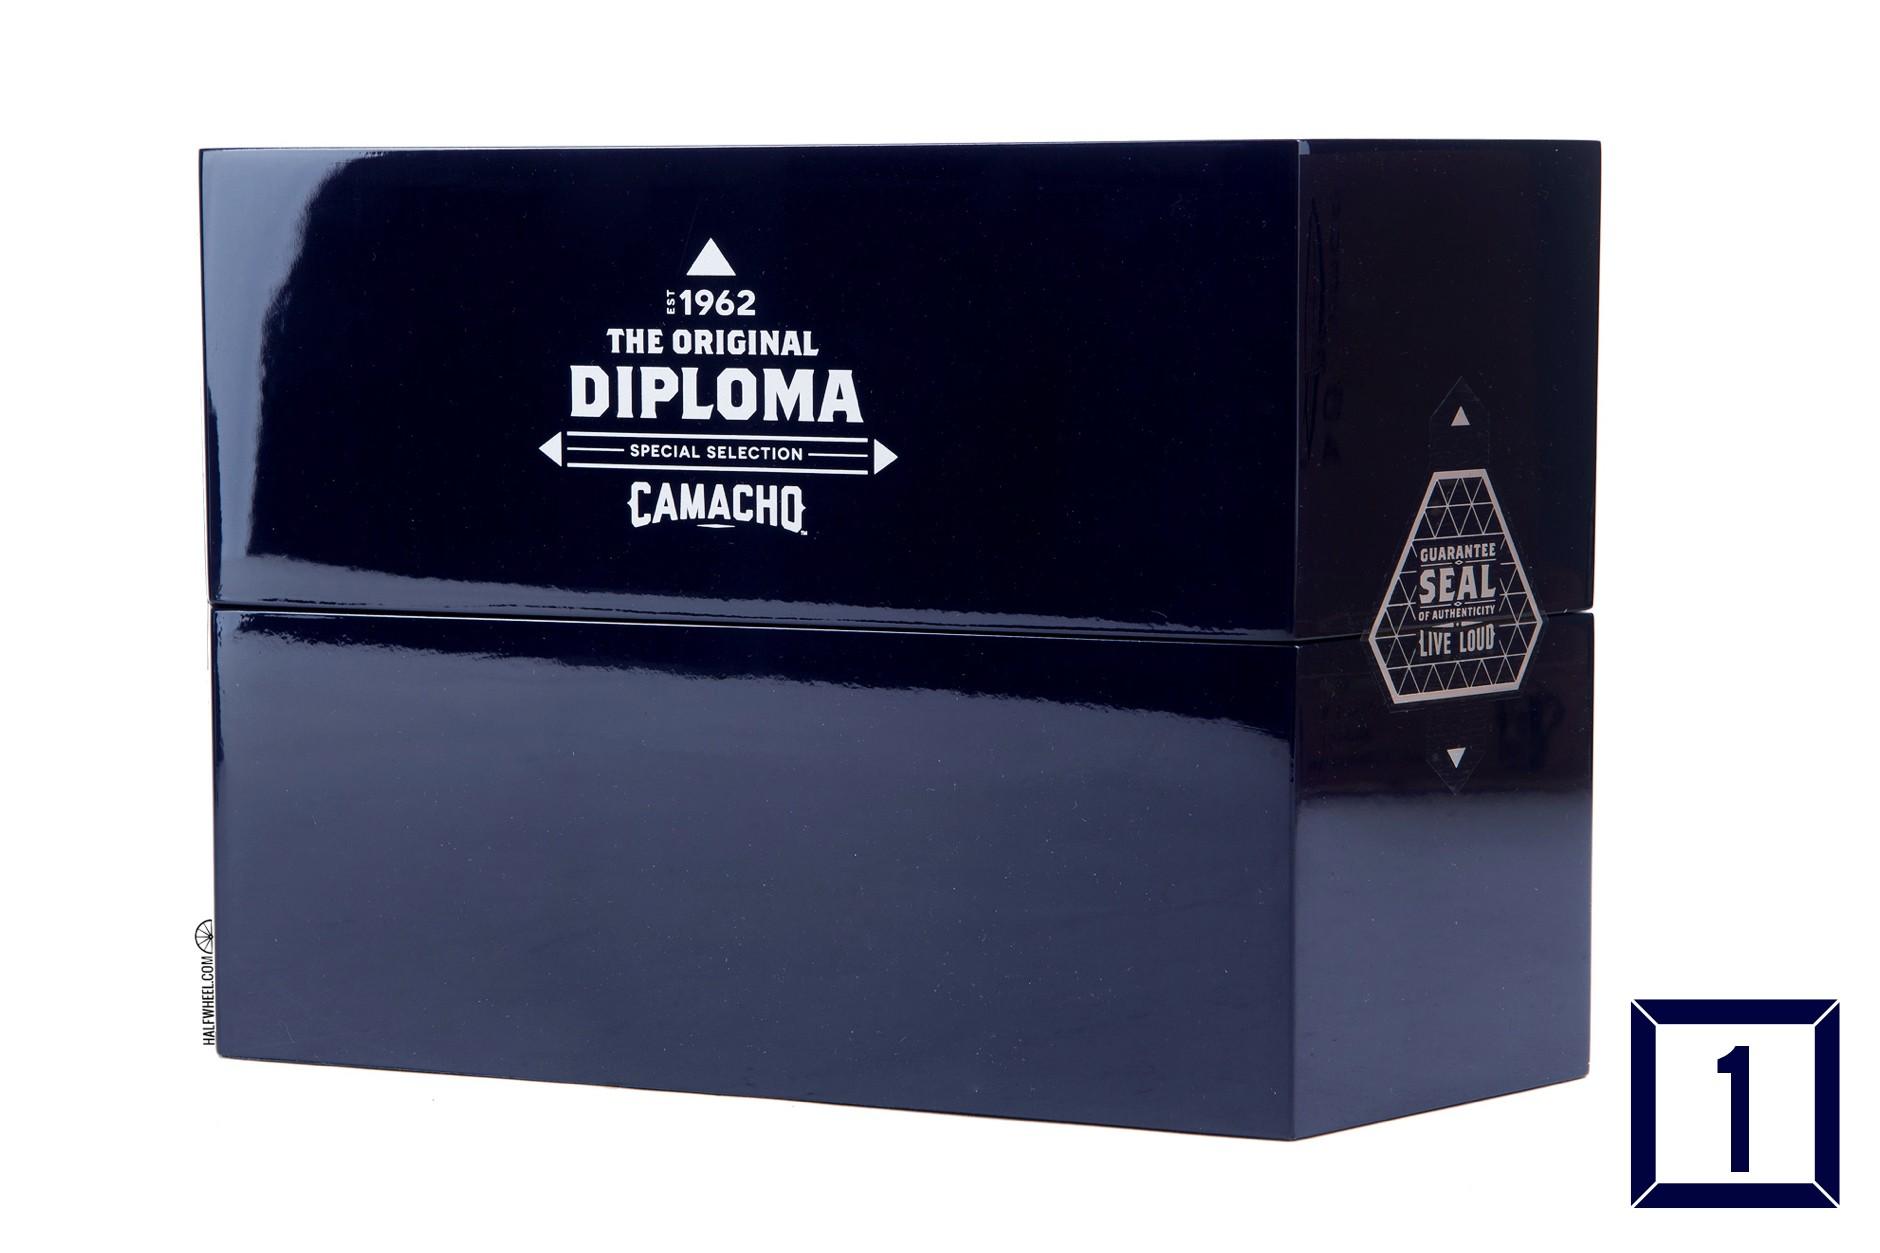 Camacho-Diploma-001